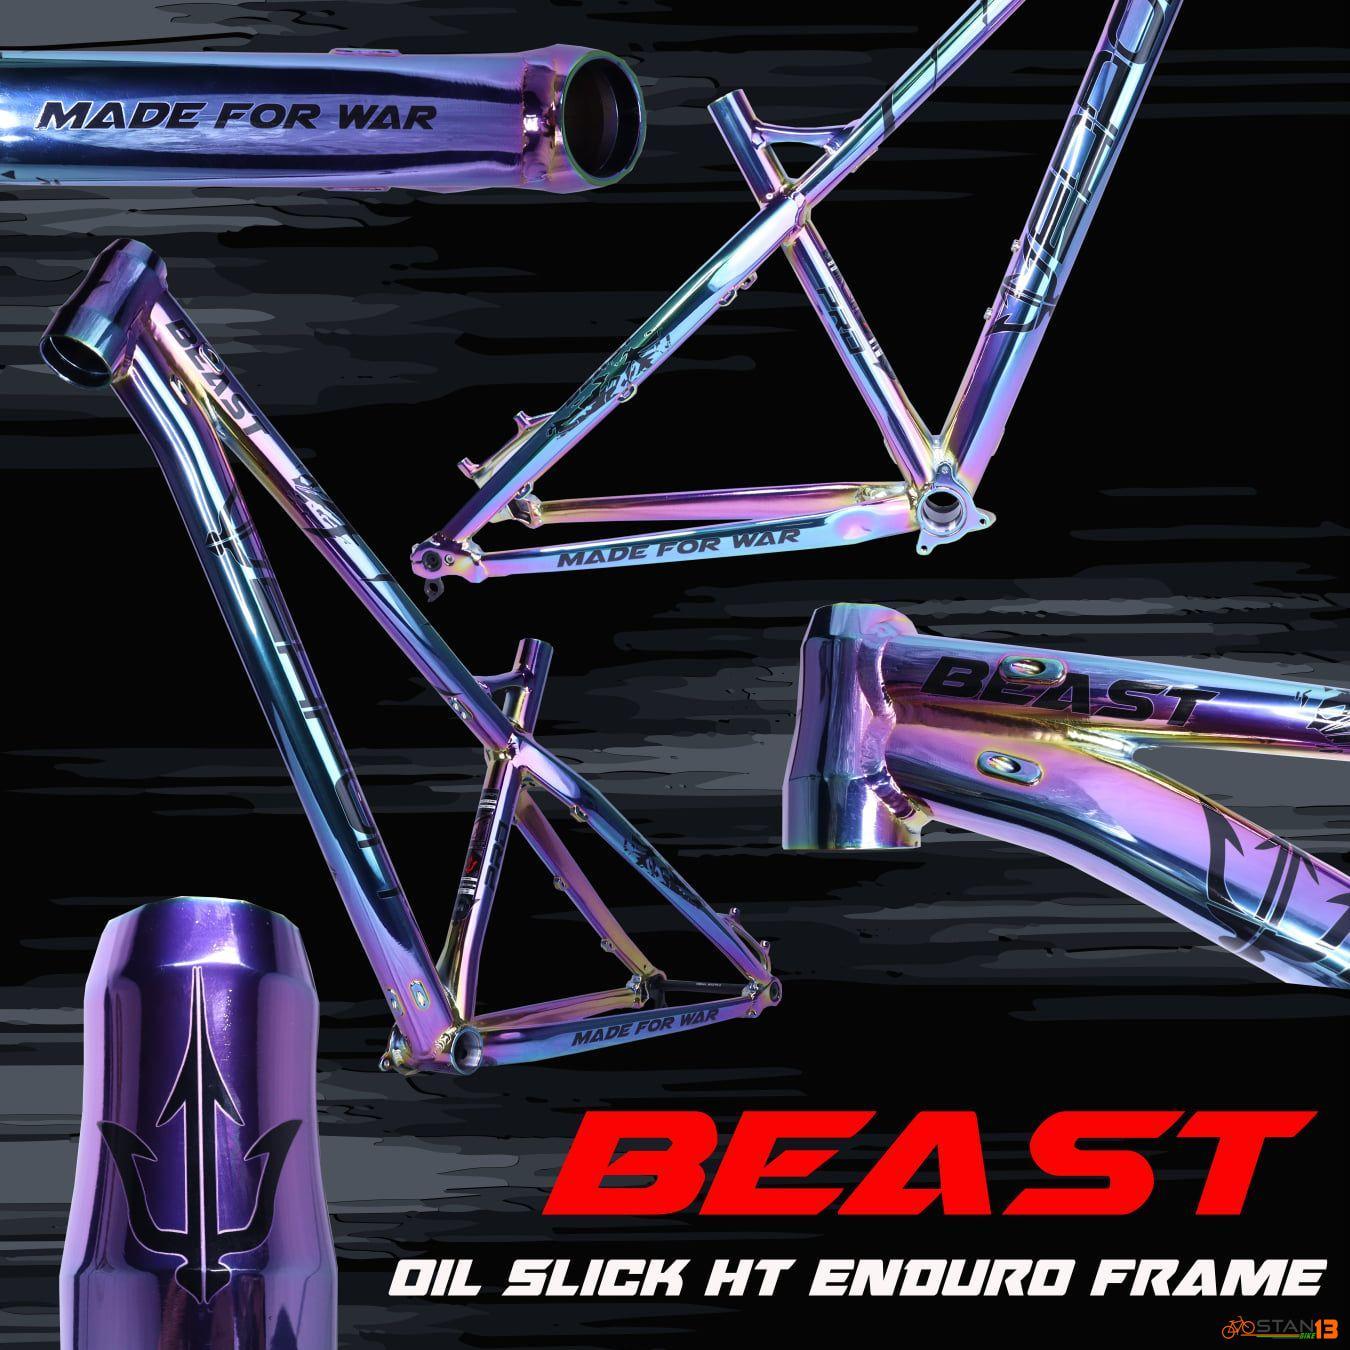 Frame Weapon BEAST Oil Slick Enduro 27.5 Frame Limited Edition